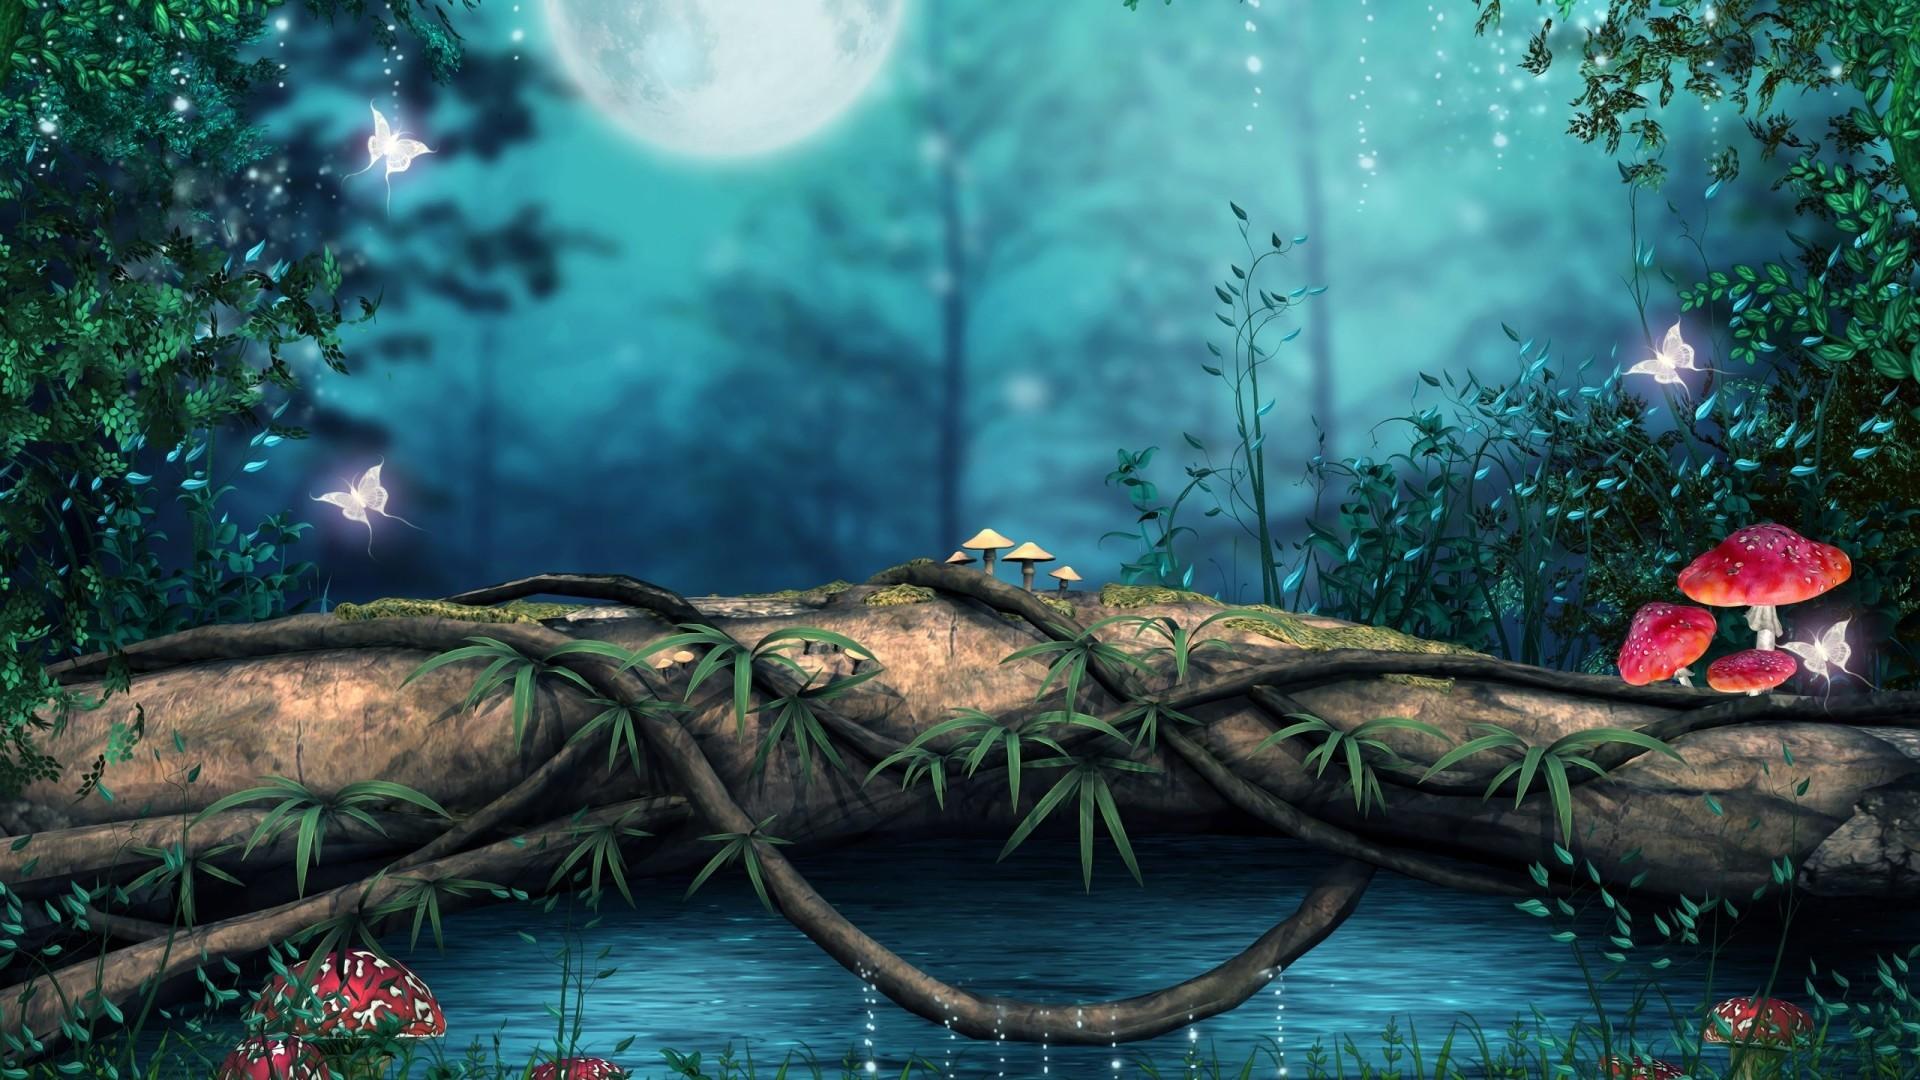 Nature Forest 3D Landscape Wallpaper